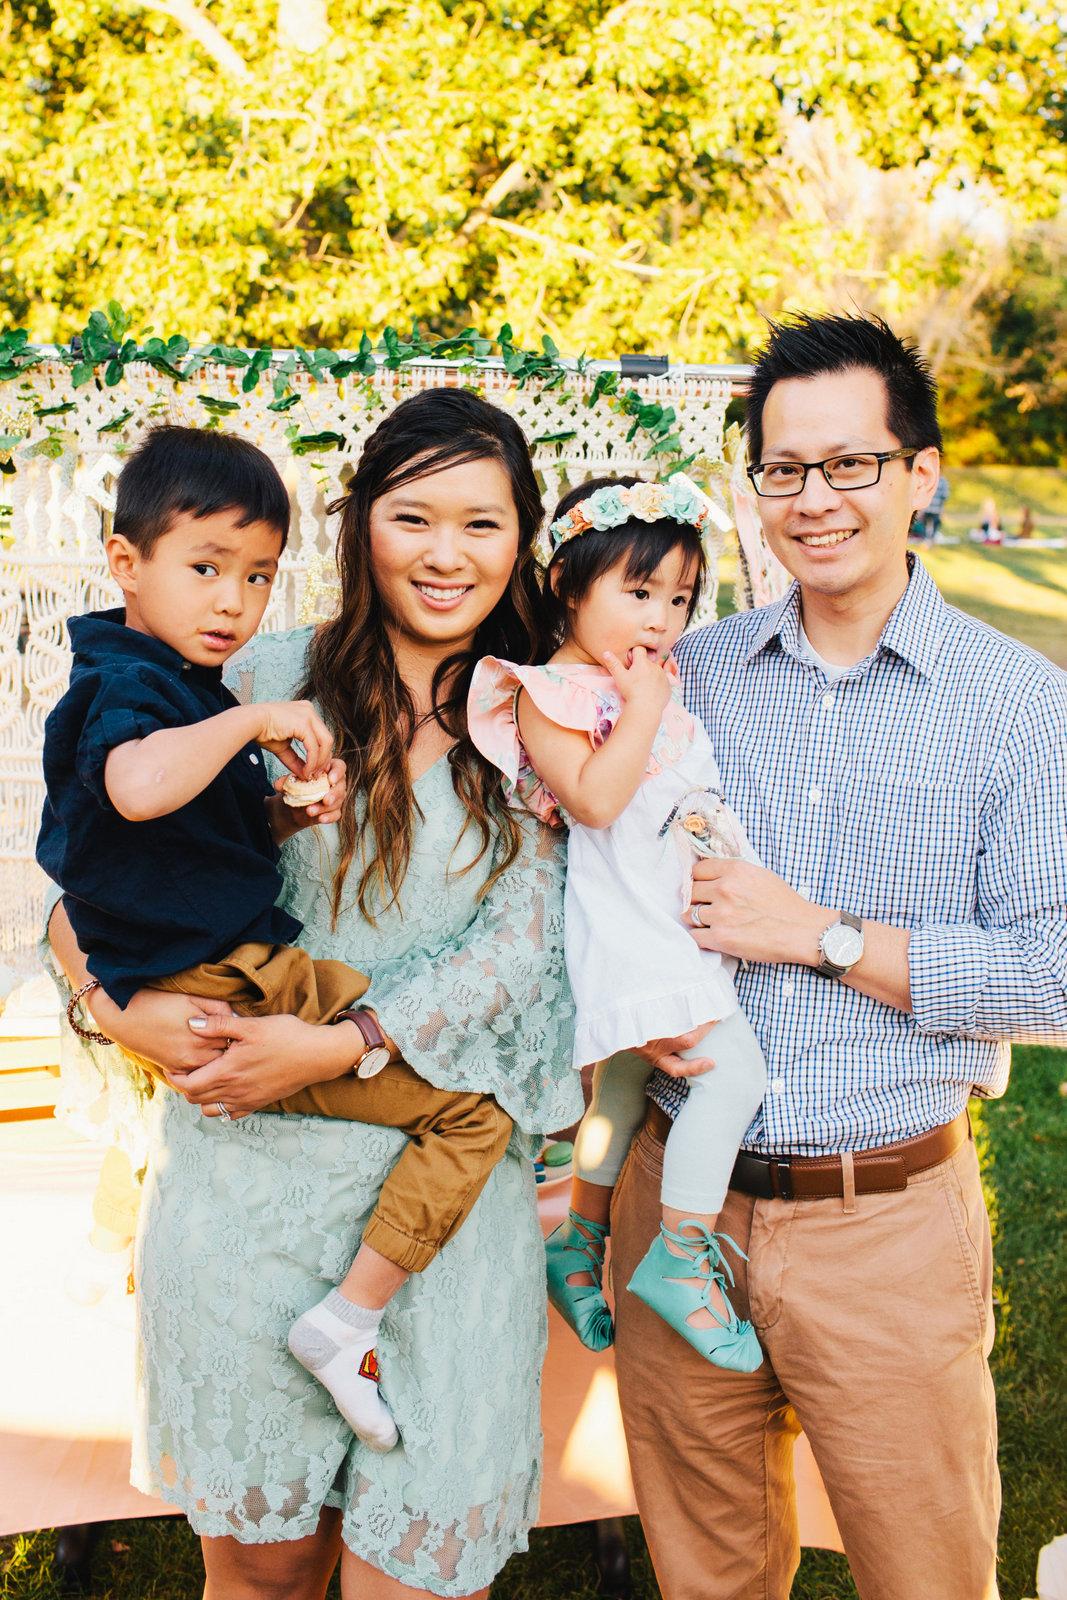 Family photos - Photo by Pierson Photo Company